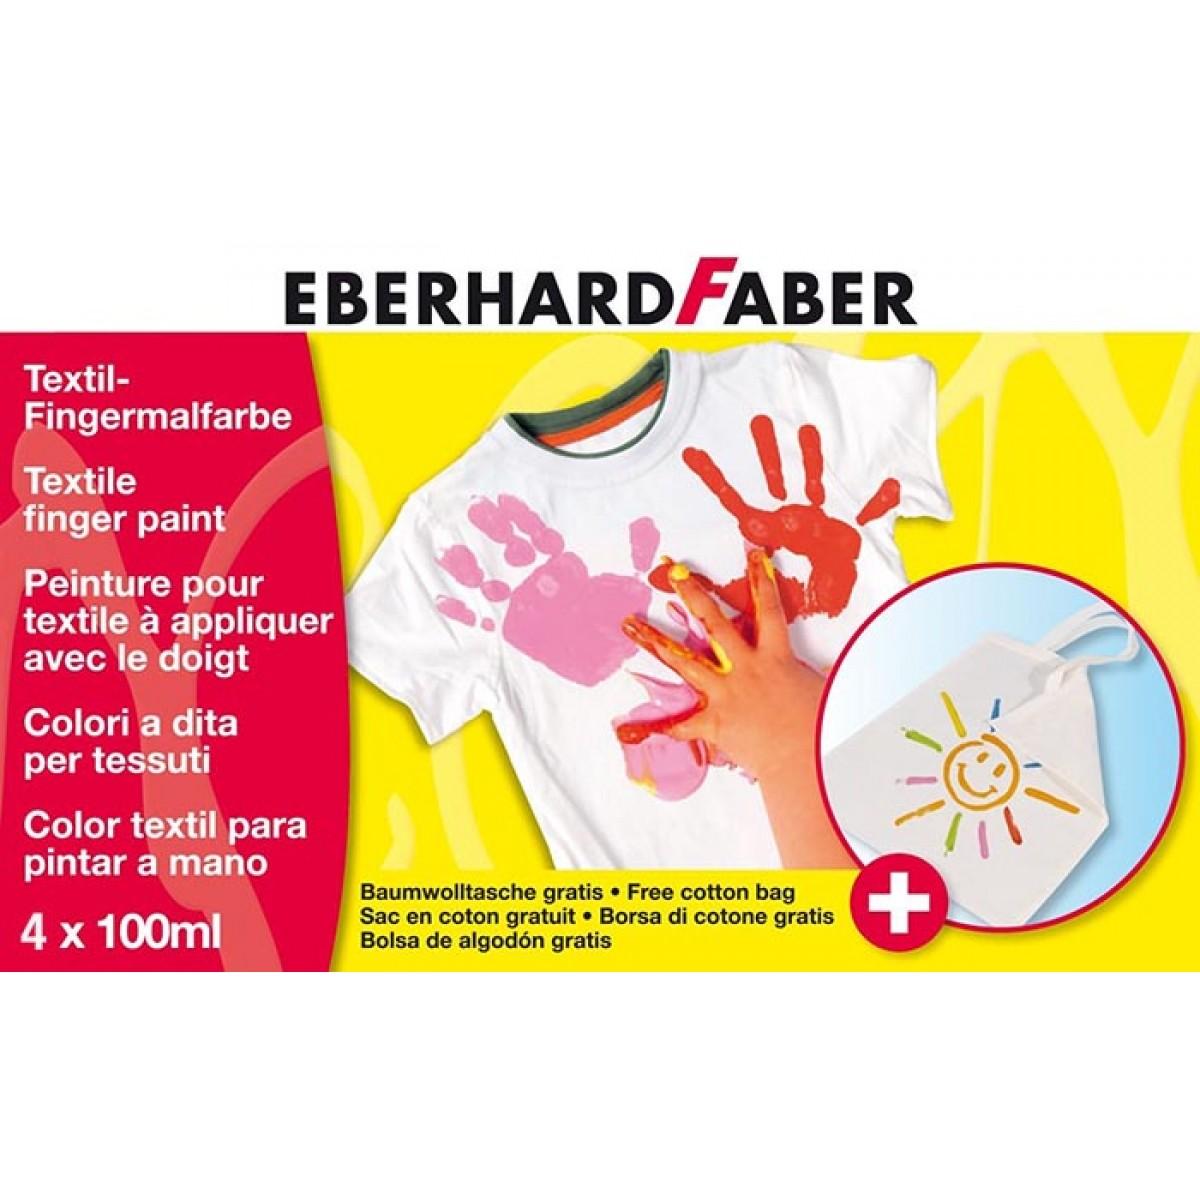 Eberhard Faber Δακτυλομπογιές Textile (4 Χρώματα) 100ml + Μια Πάνινη Τσάντα Είδη Ζωγραφικής